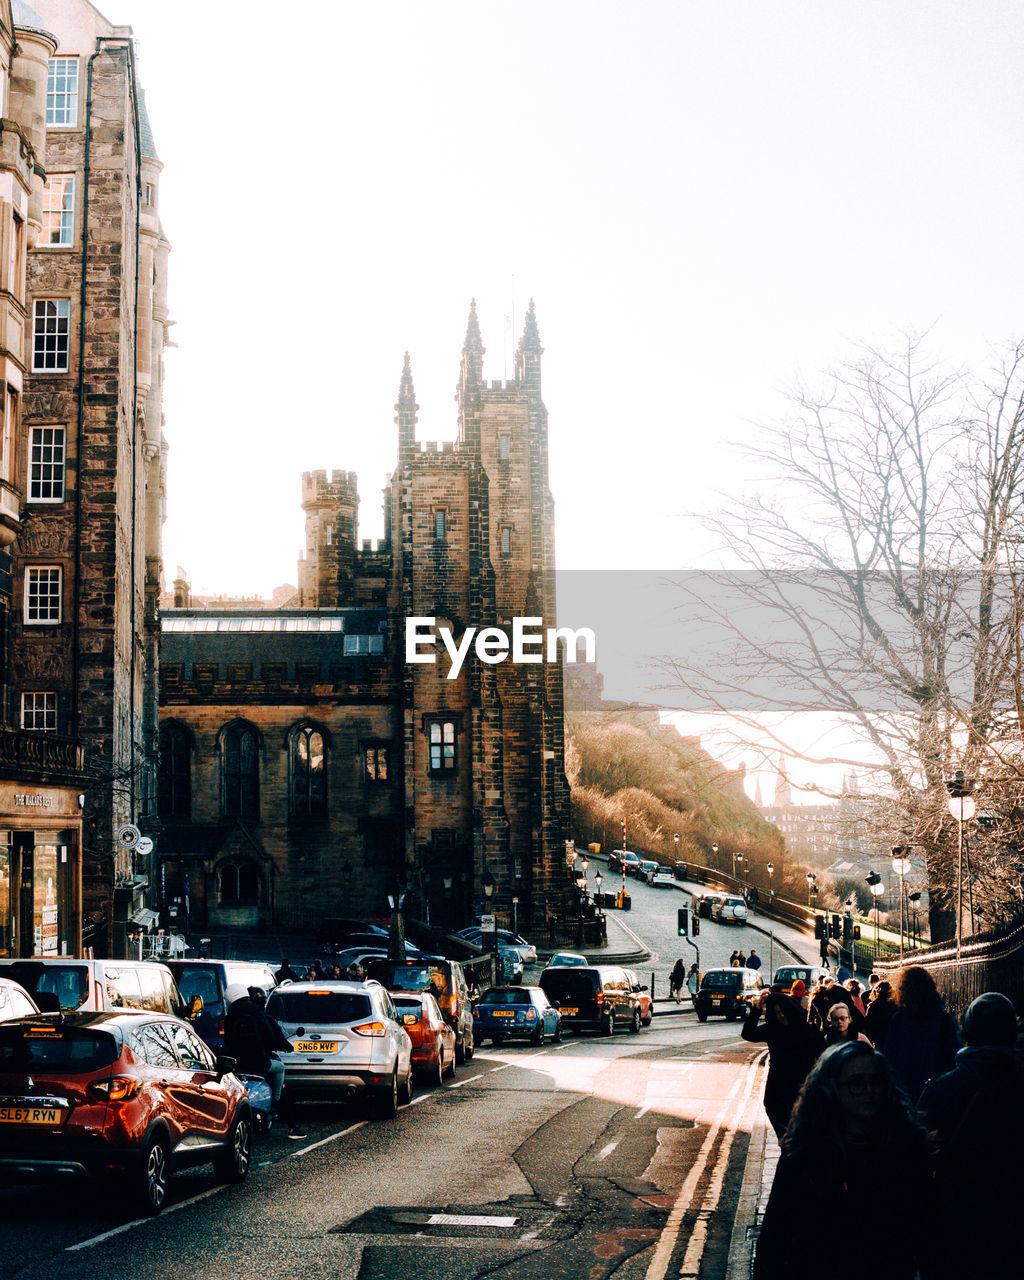 VEHICLES ON CITY STREET AGAINST CLEAR SKY